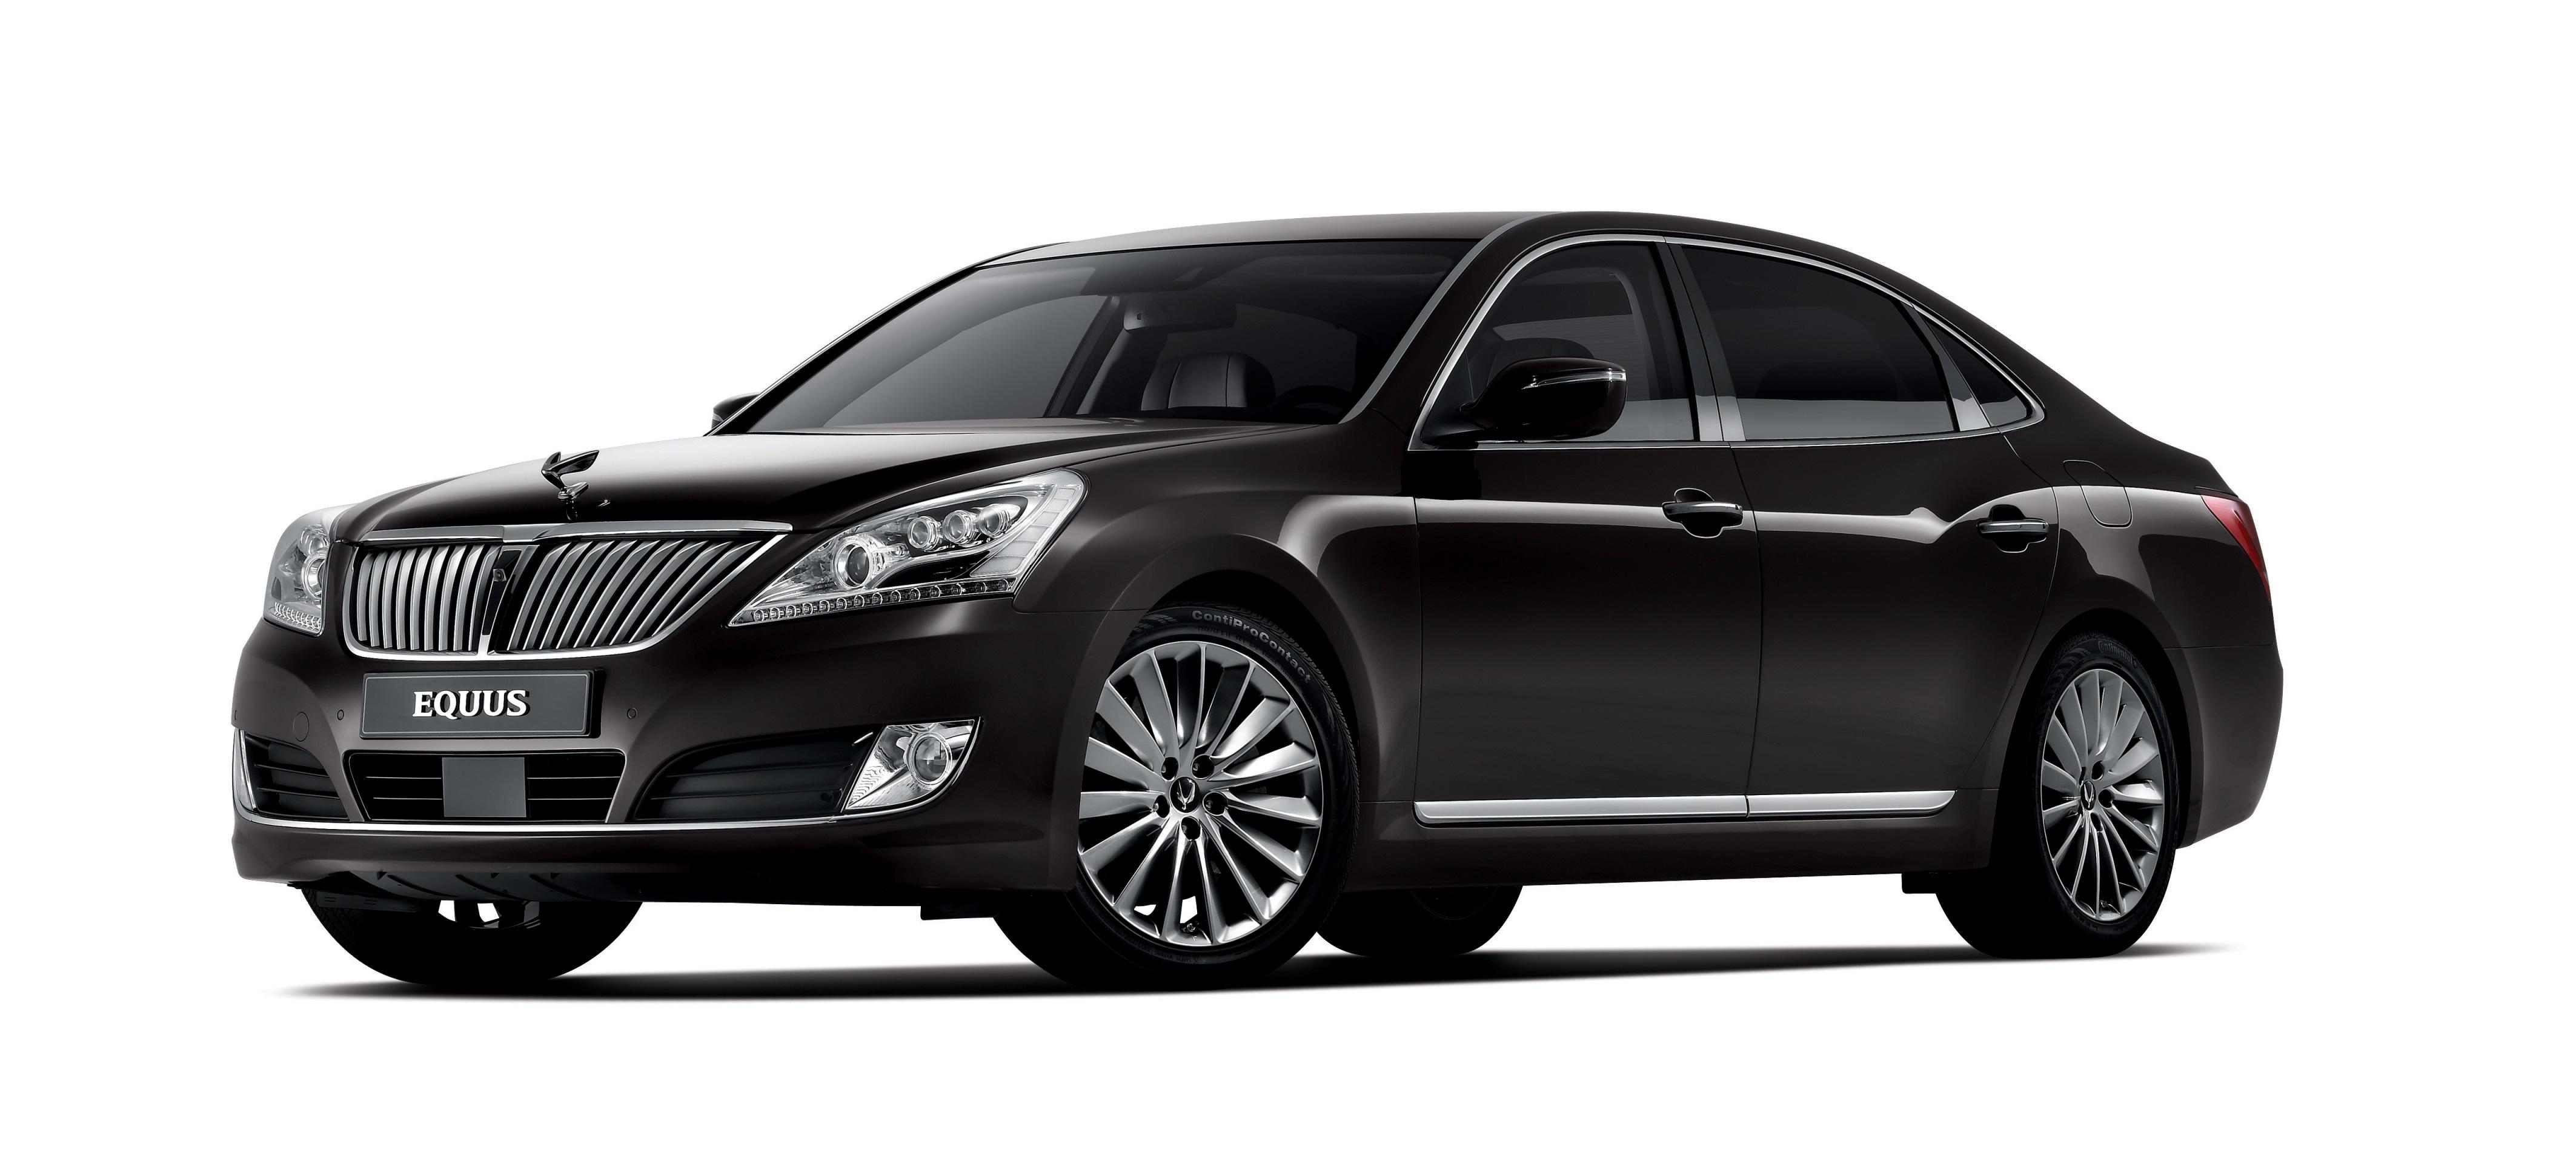 hyundai equus facelift hyundai motor company. Black Bedroom Furniture Sets. Home Design Ideas